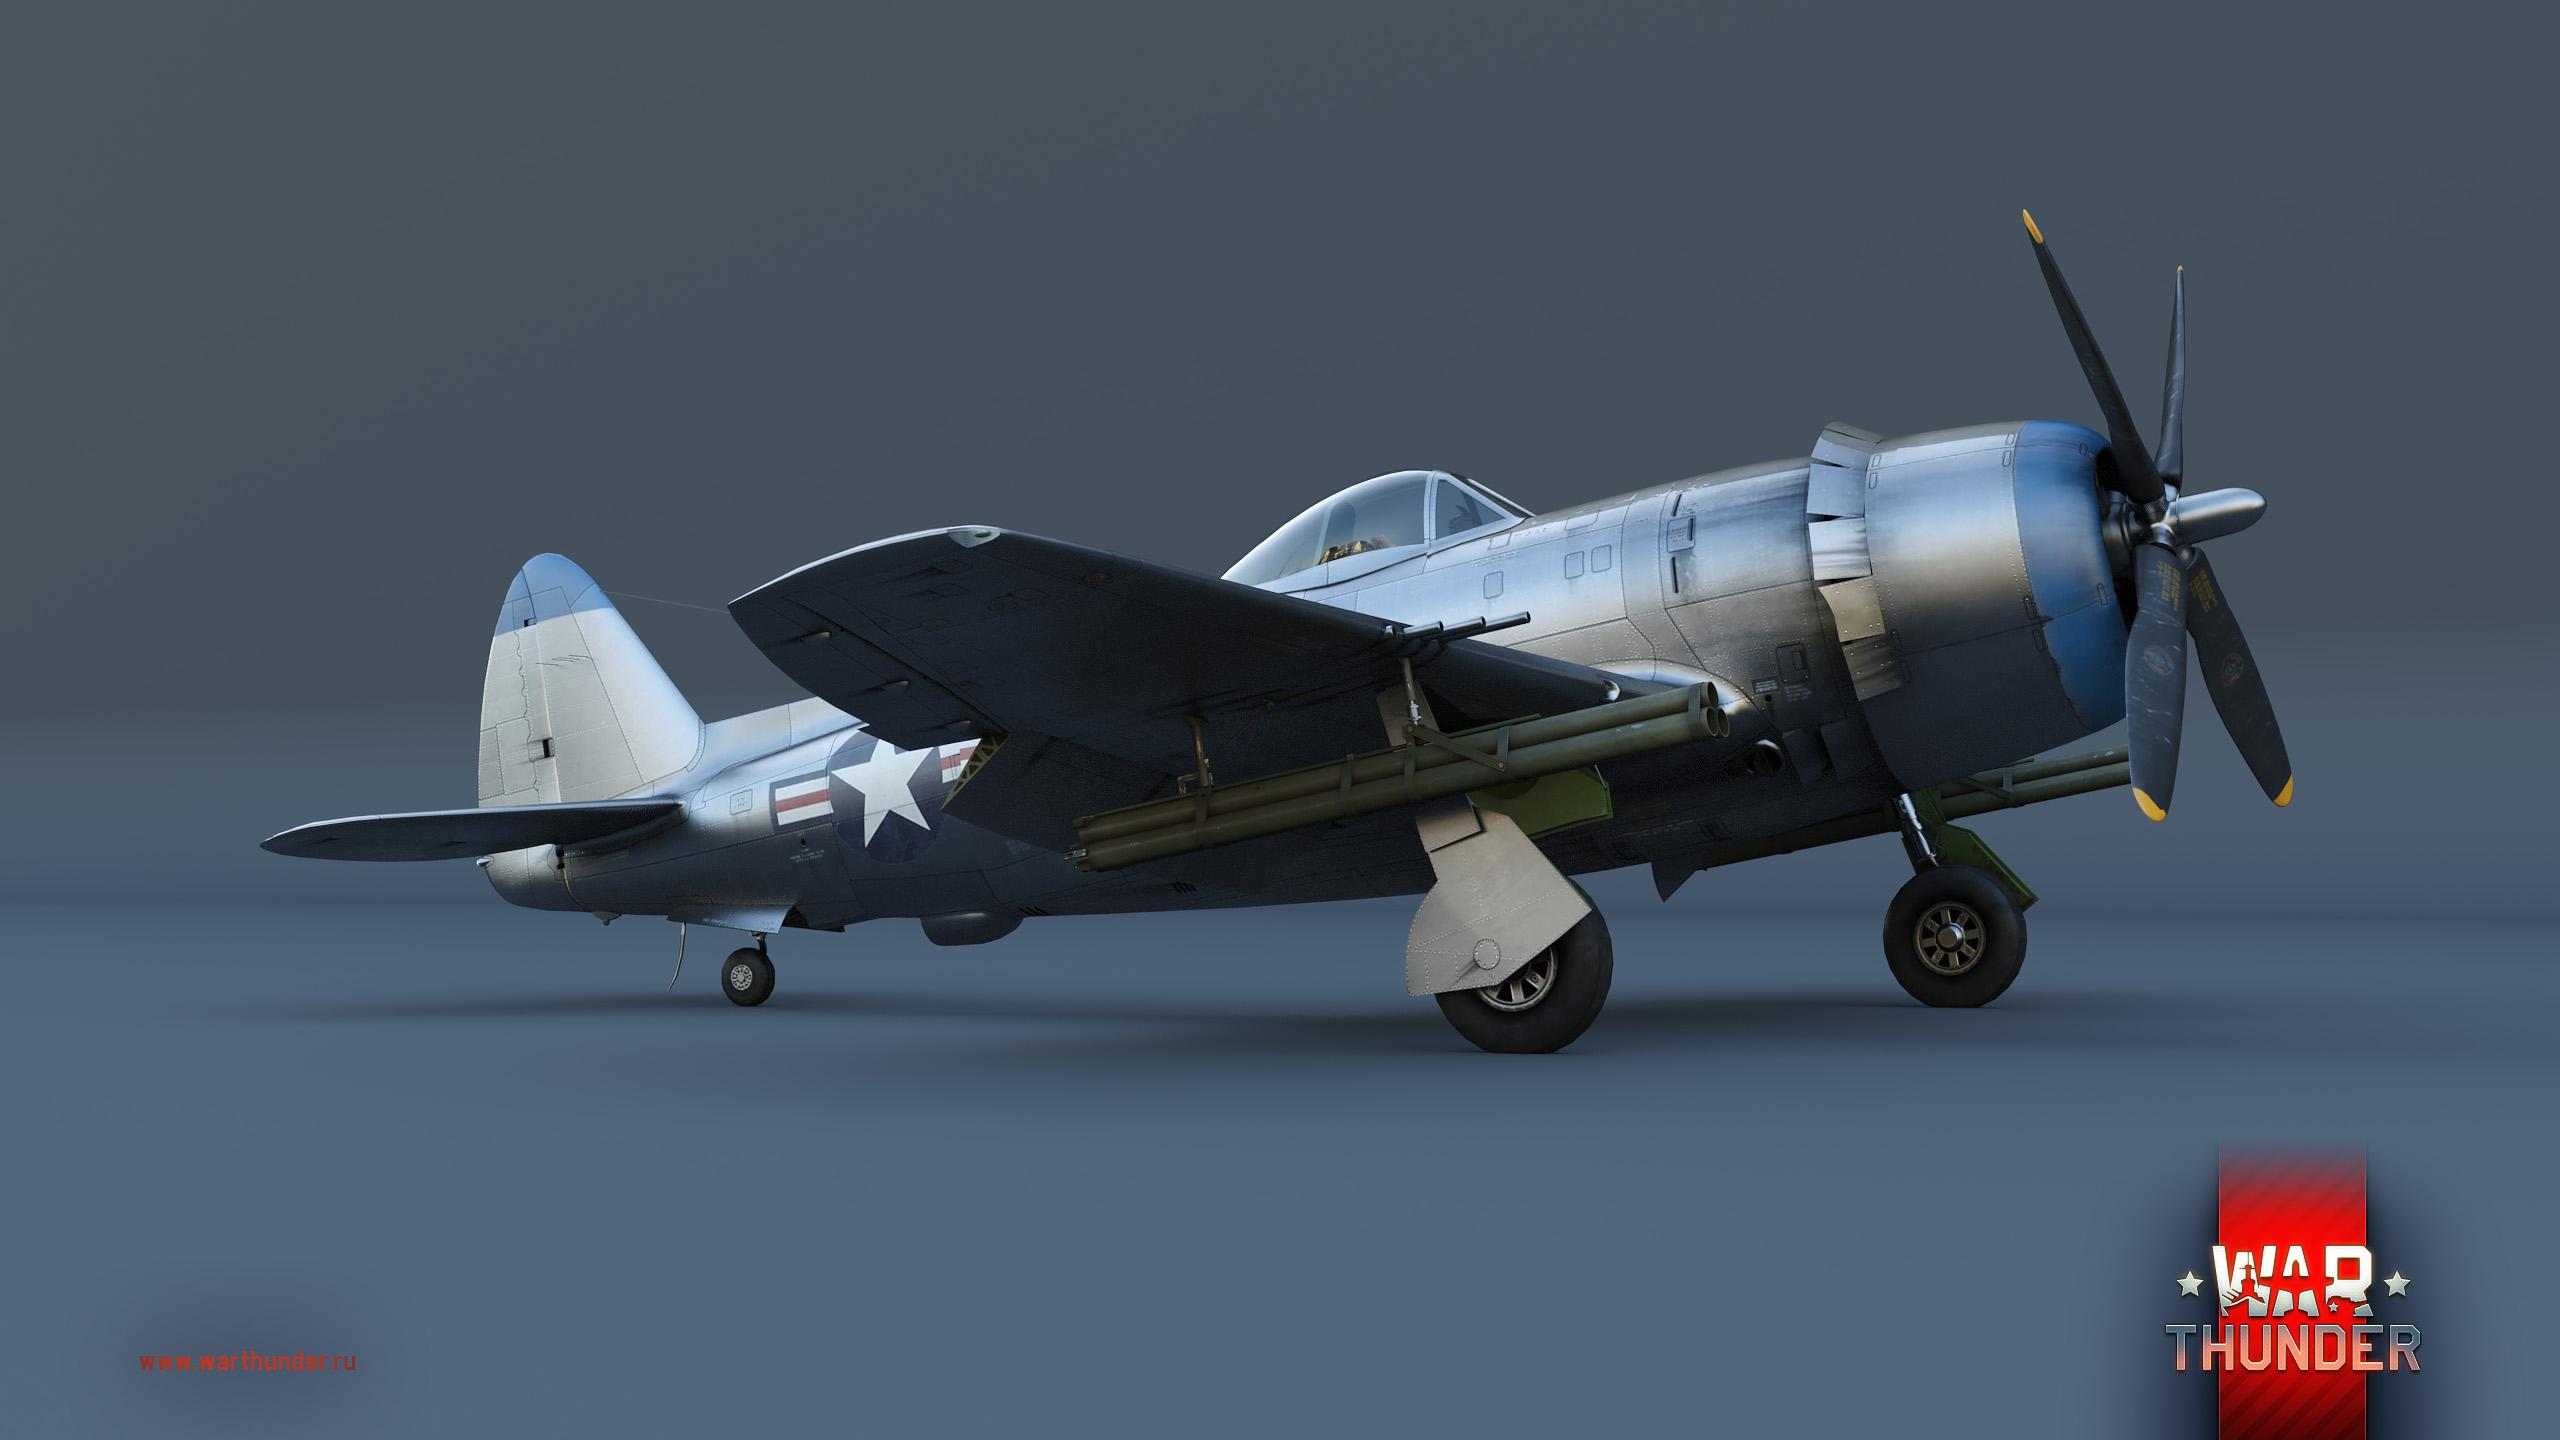 Обои обломки, Самолёт, крылья, винт. Авиация foto 18